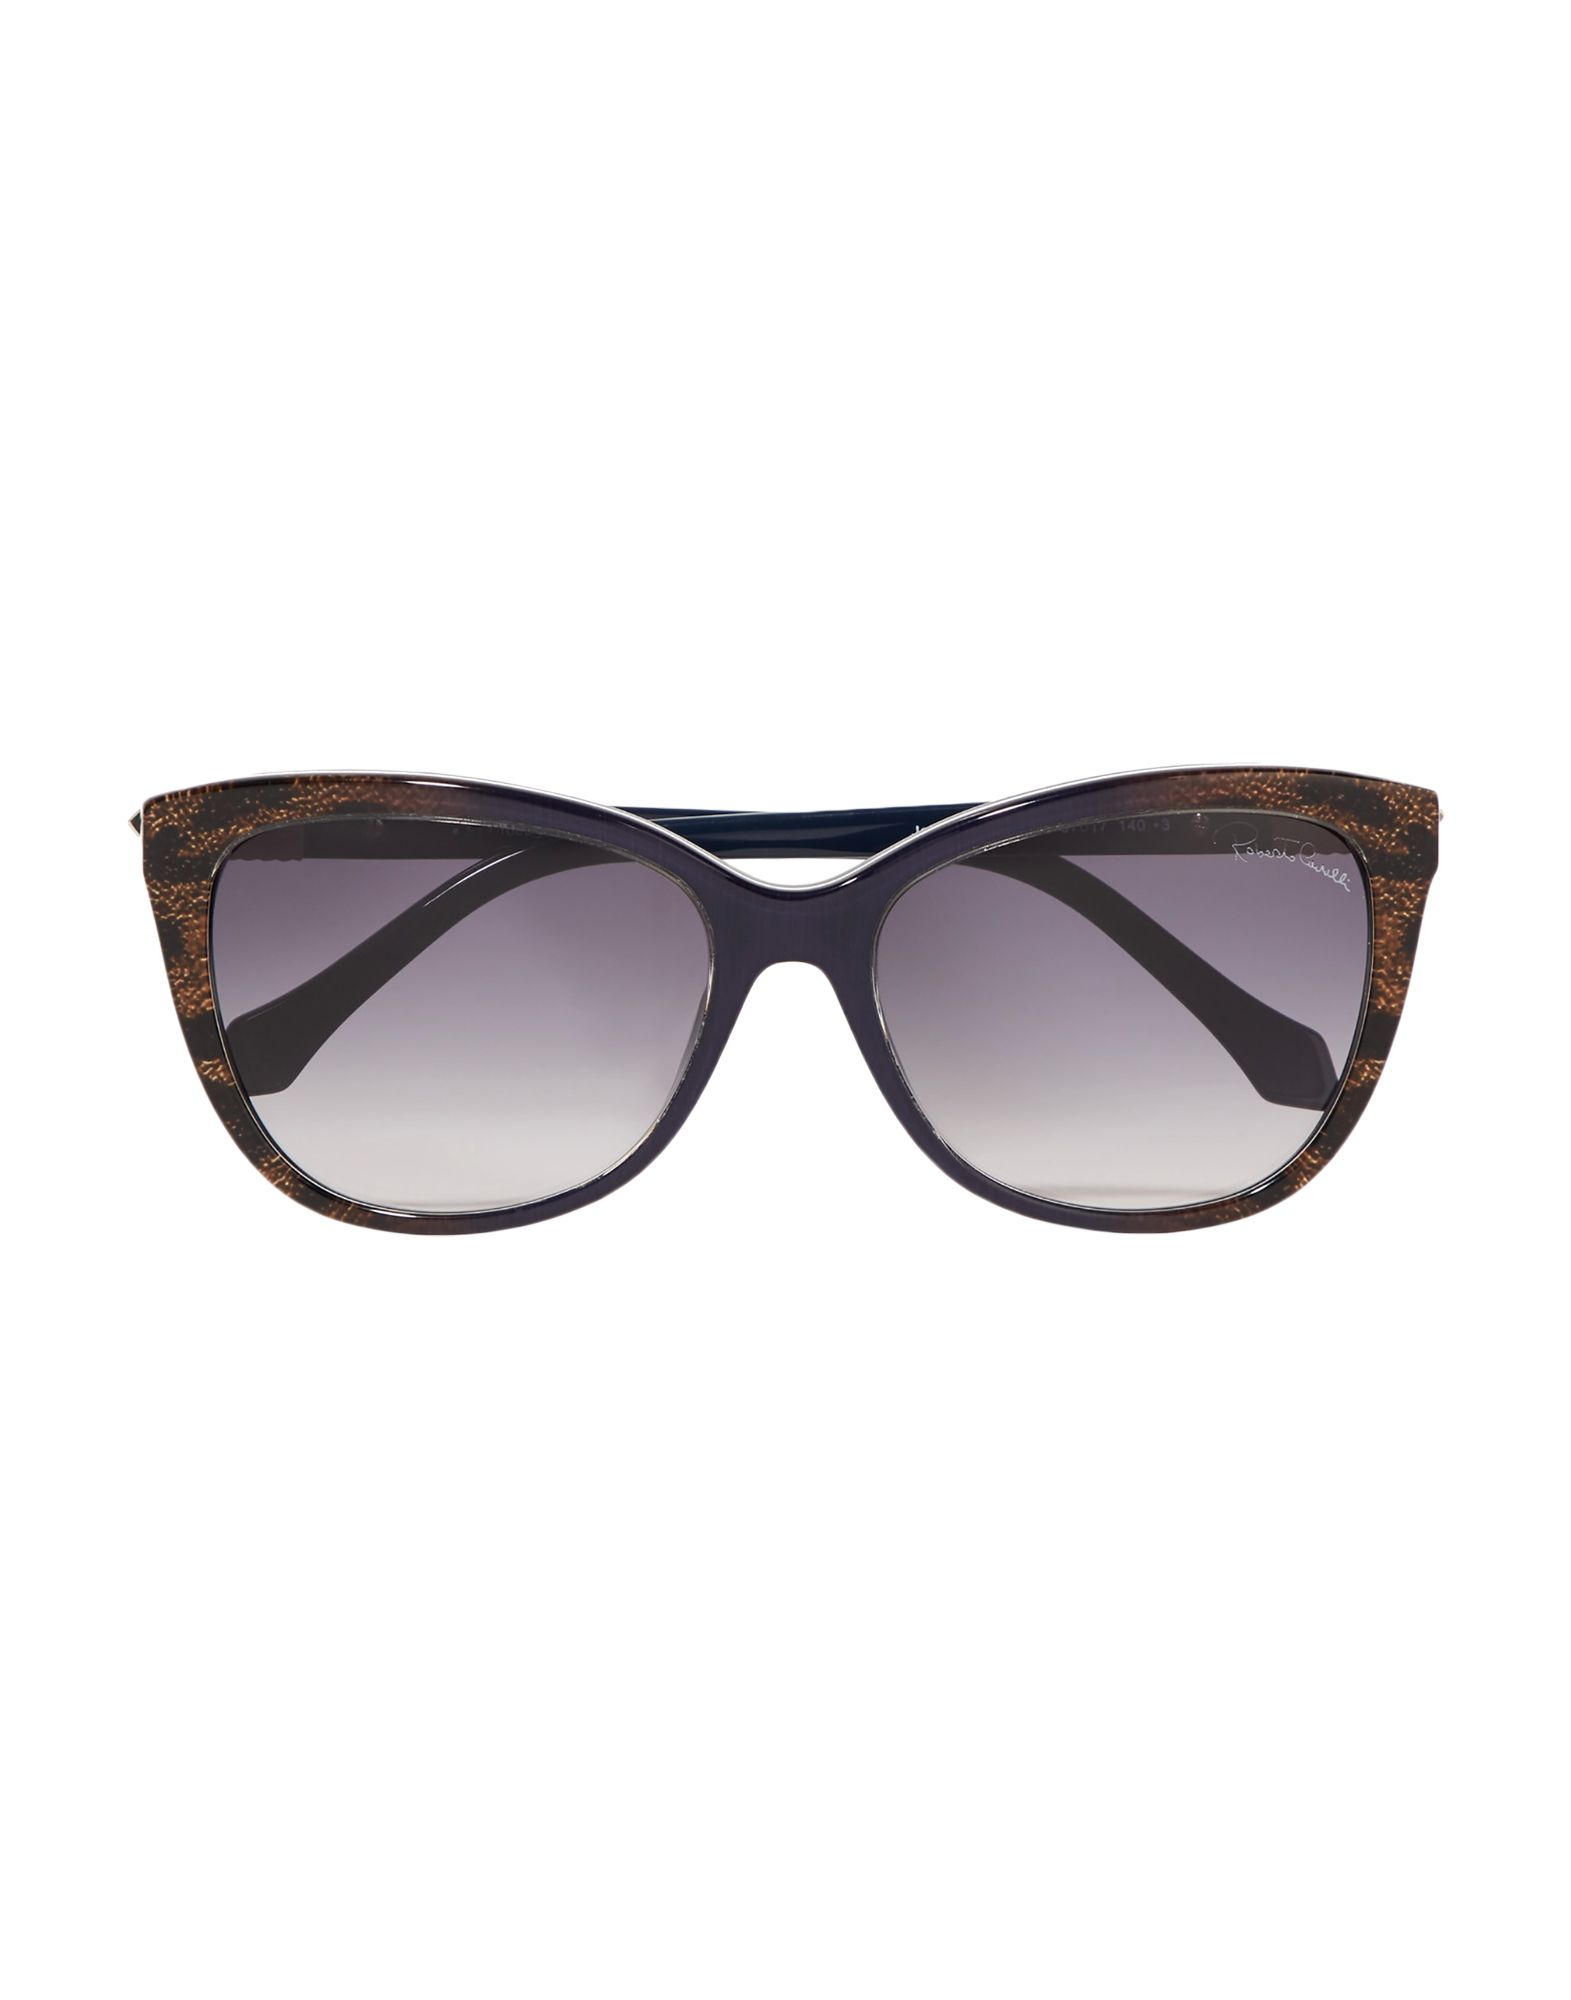 ROBERTO CAVALLI EYEWEAR Солнечные очки web eyewear солнечные очки